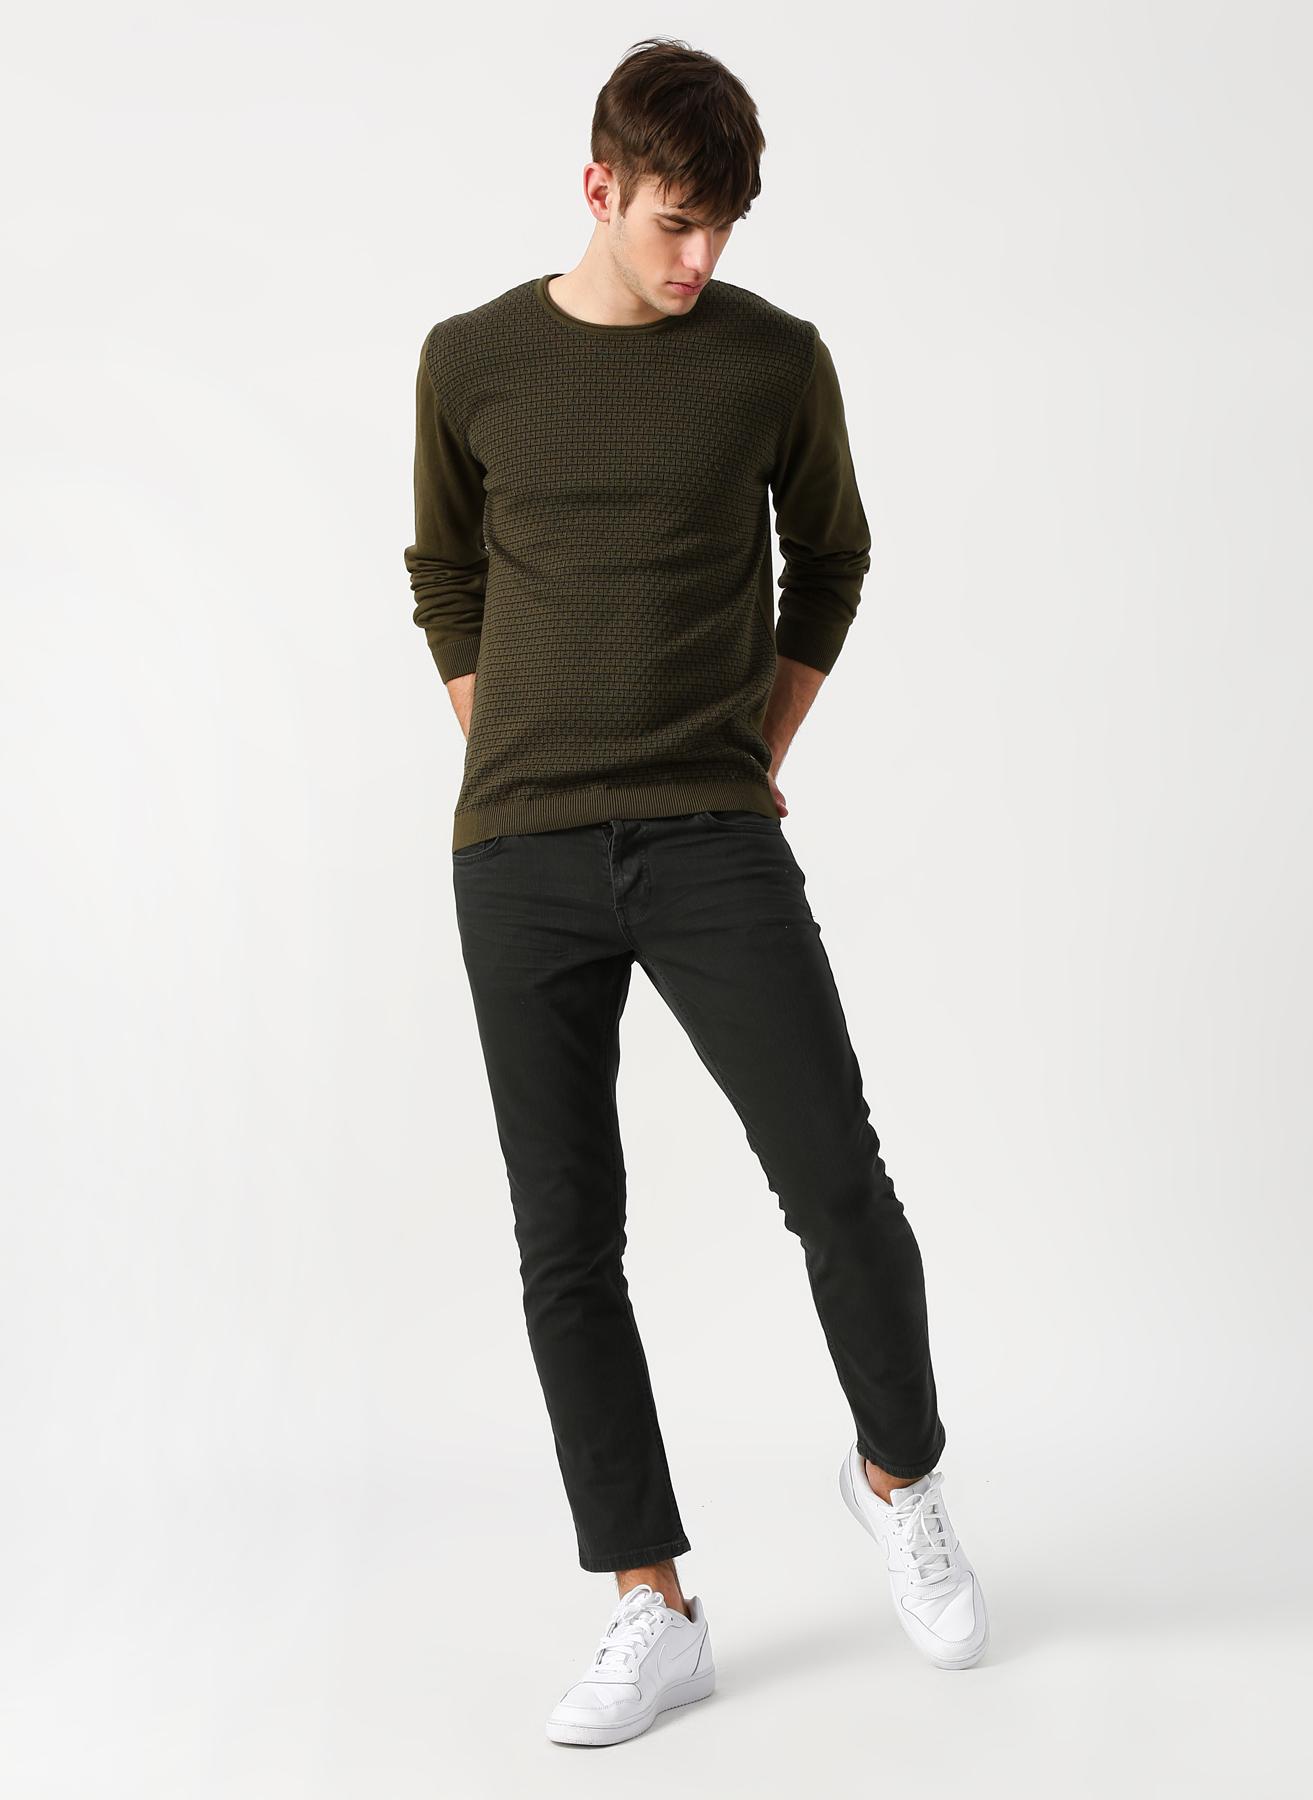 Loft Skinny A Klasik Pantolon 32-34 5001696295009 Ürün Resmi